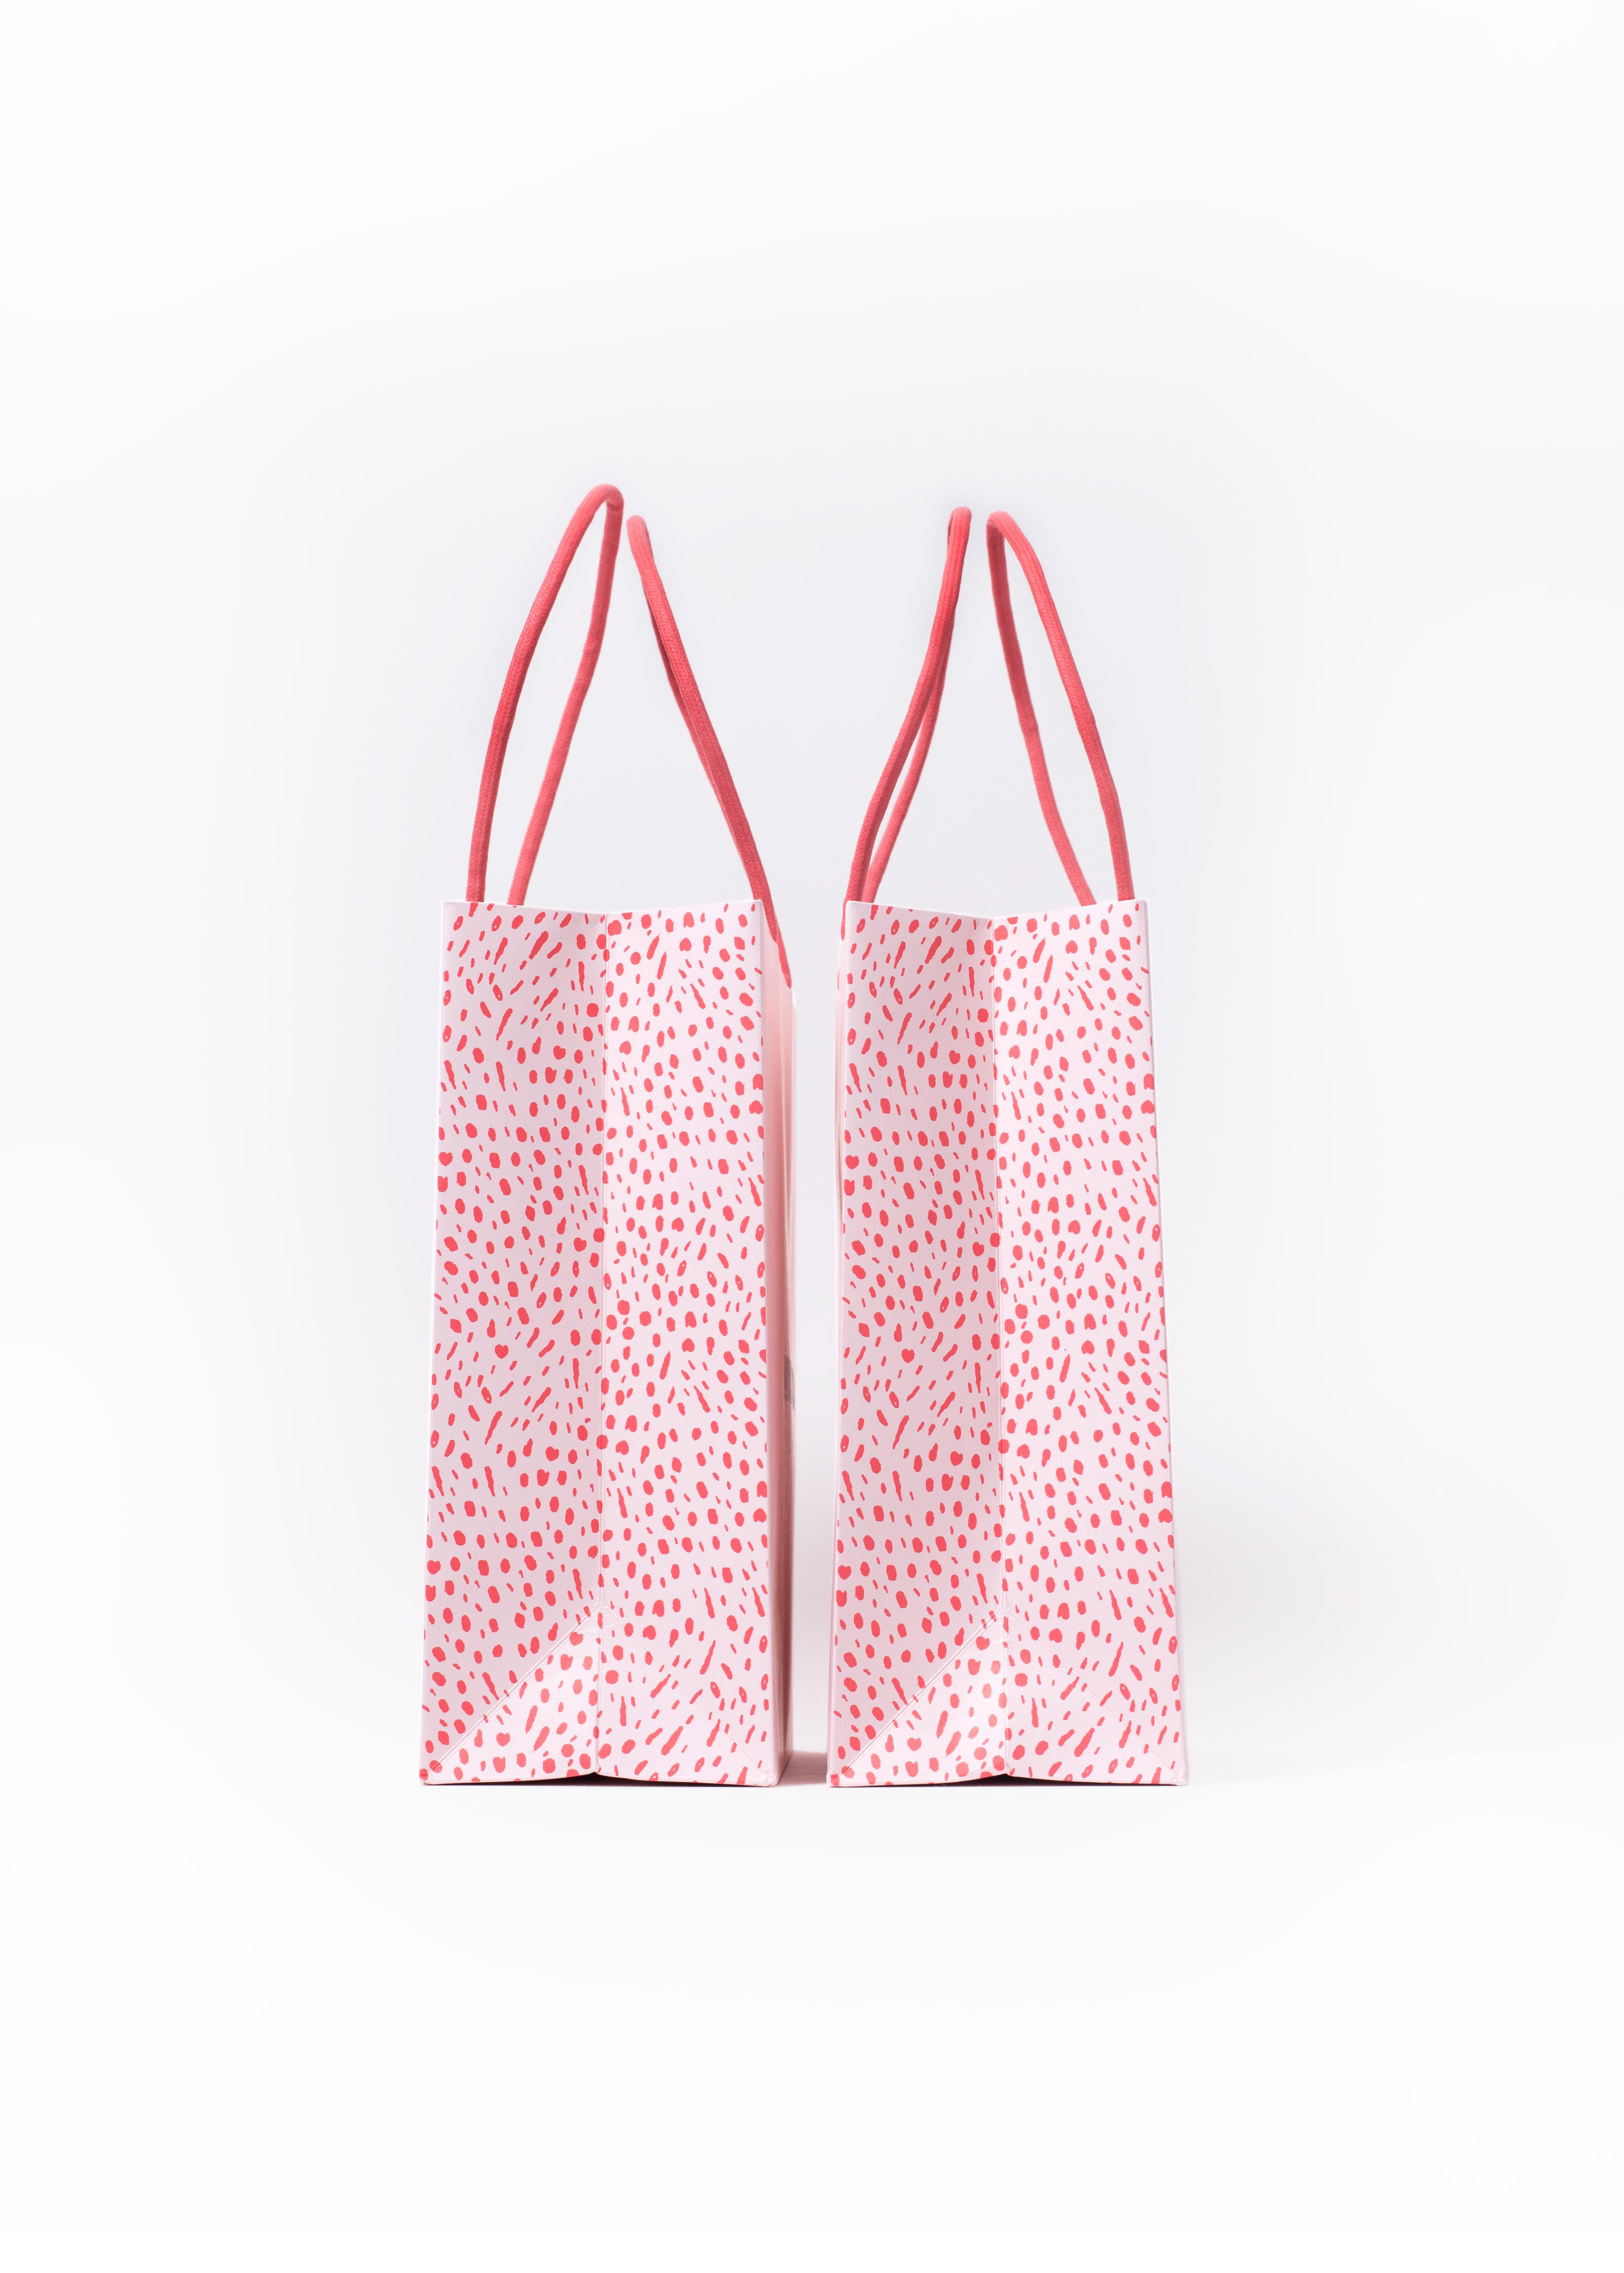 Fashion design gift ideas 28